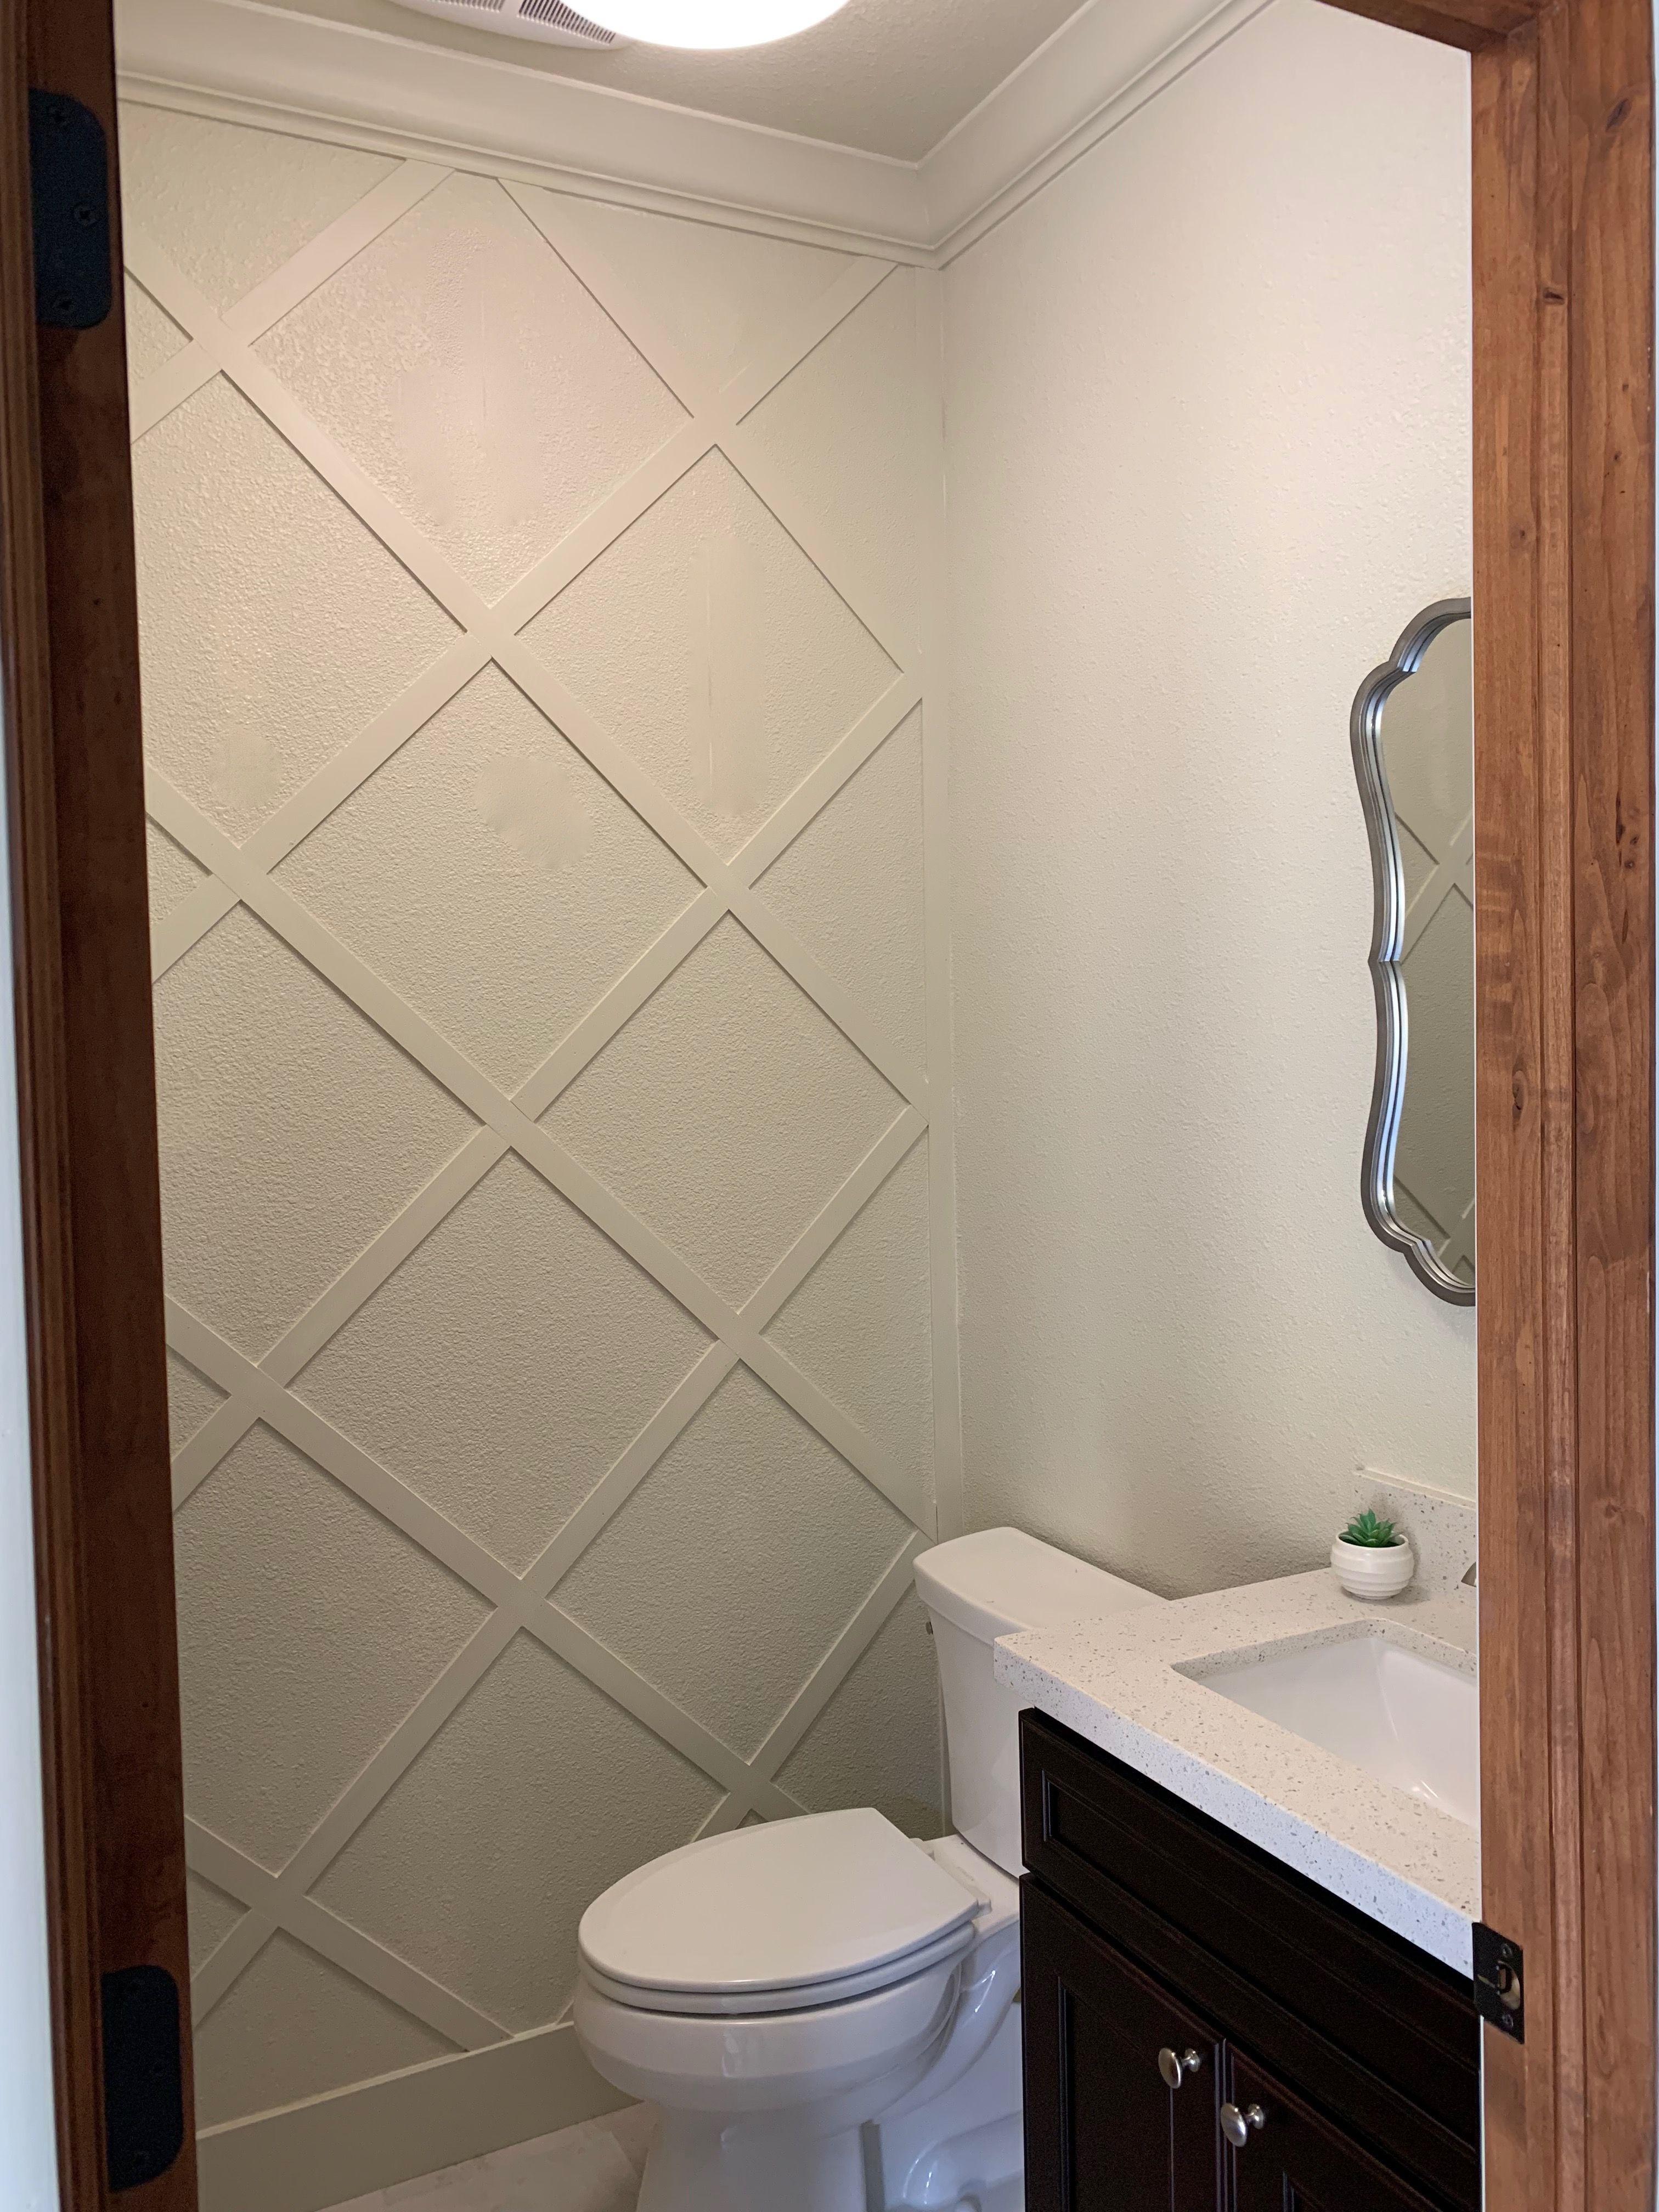 Pin On Powder Room Half bedroom wall tiles